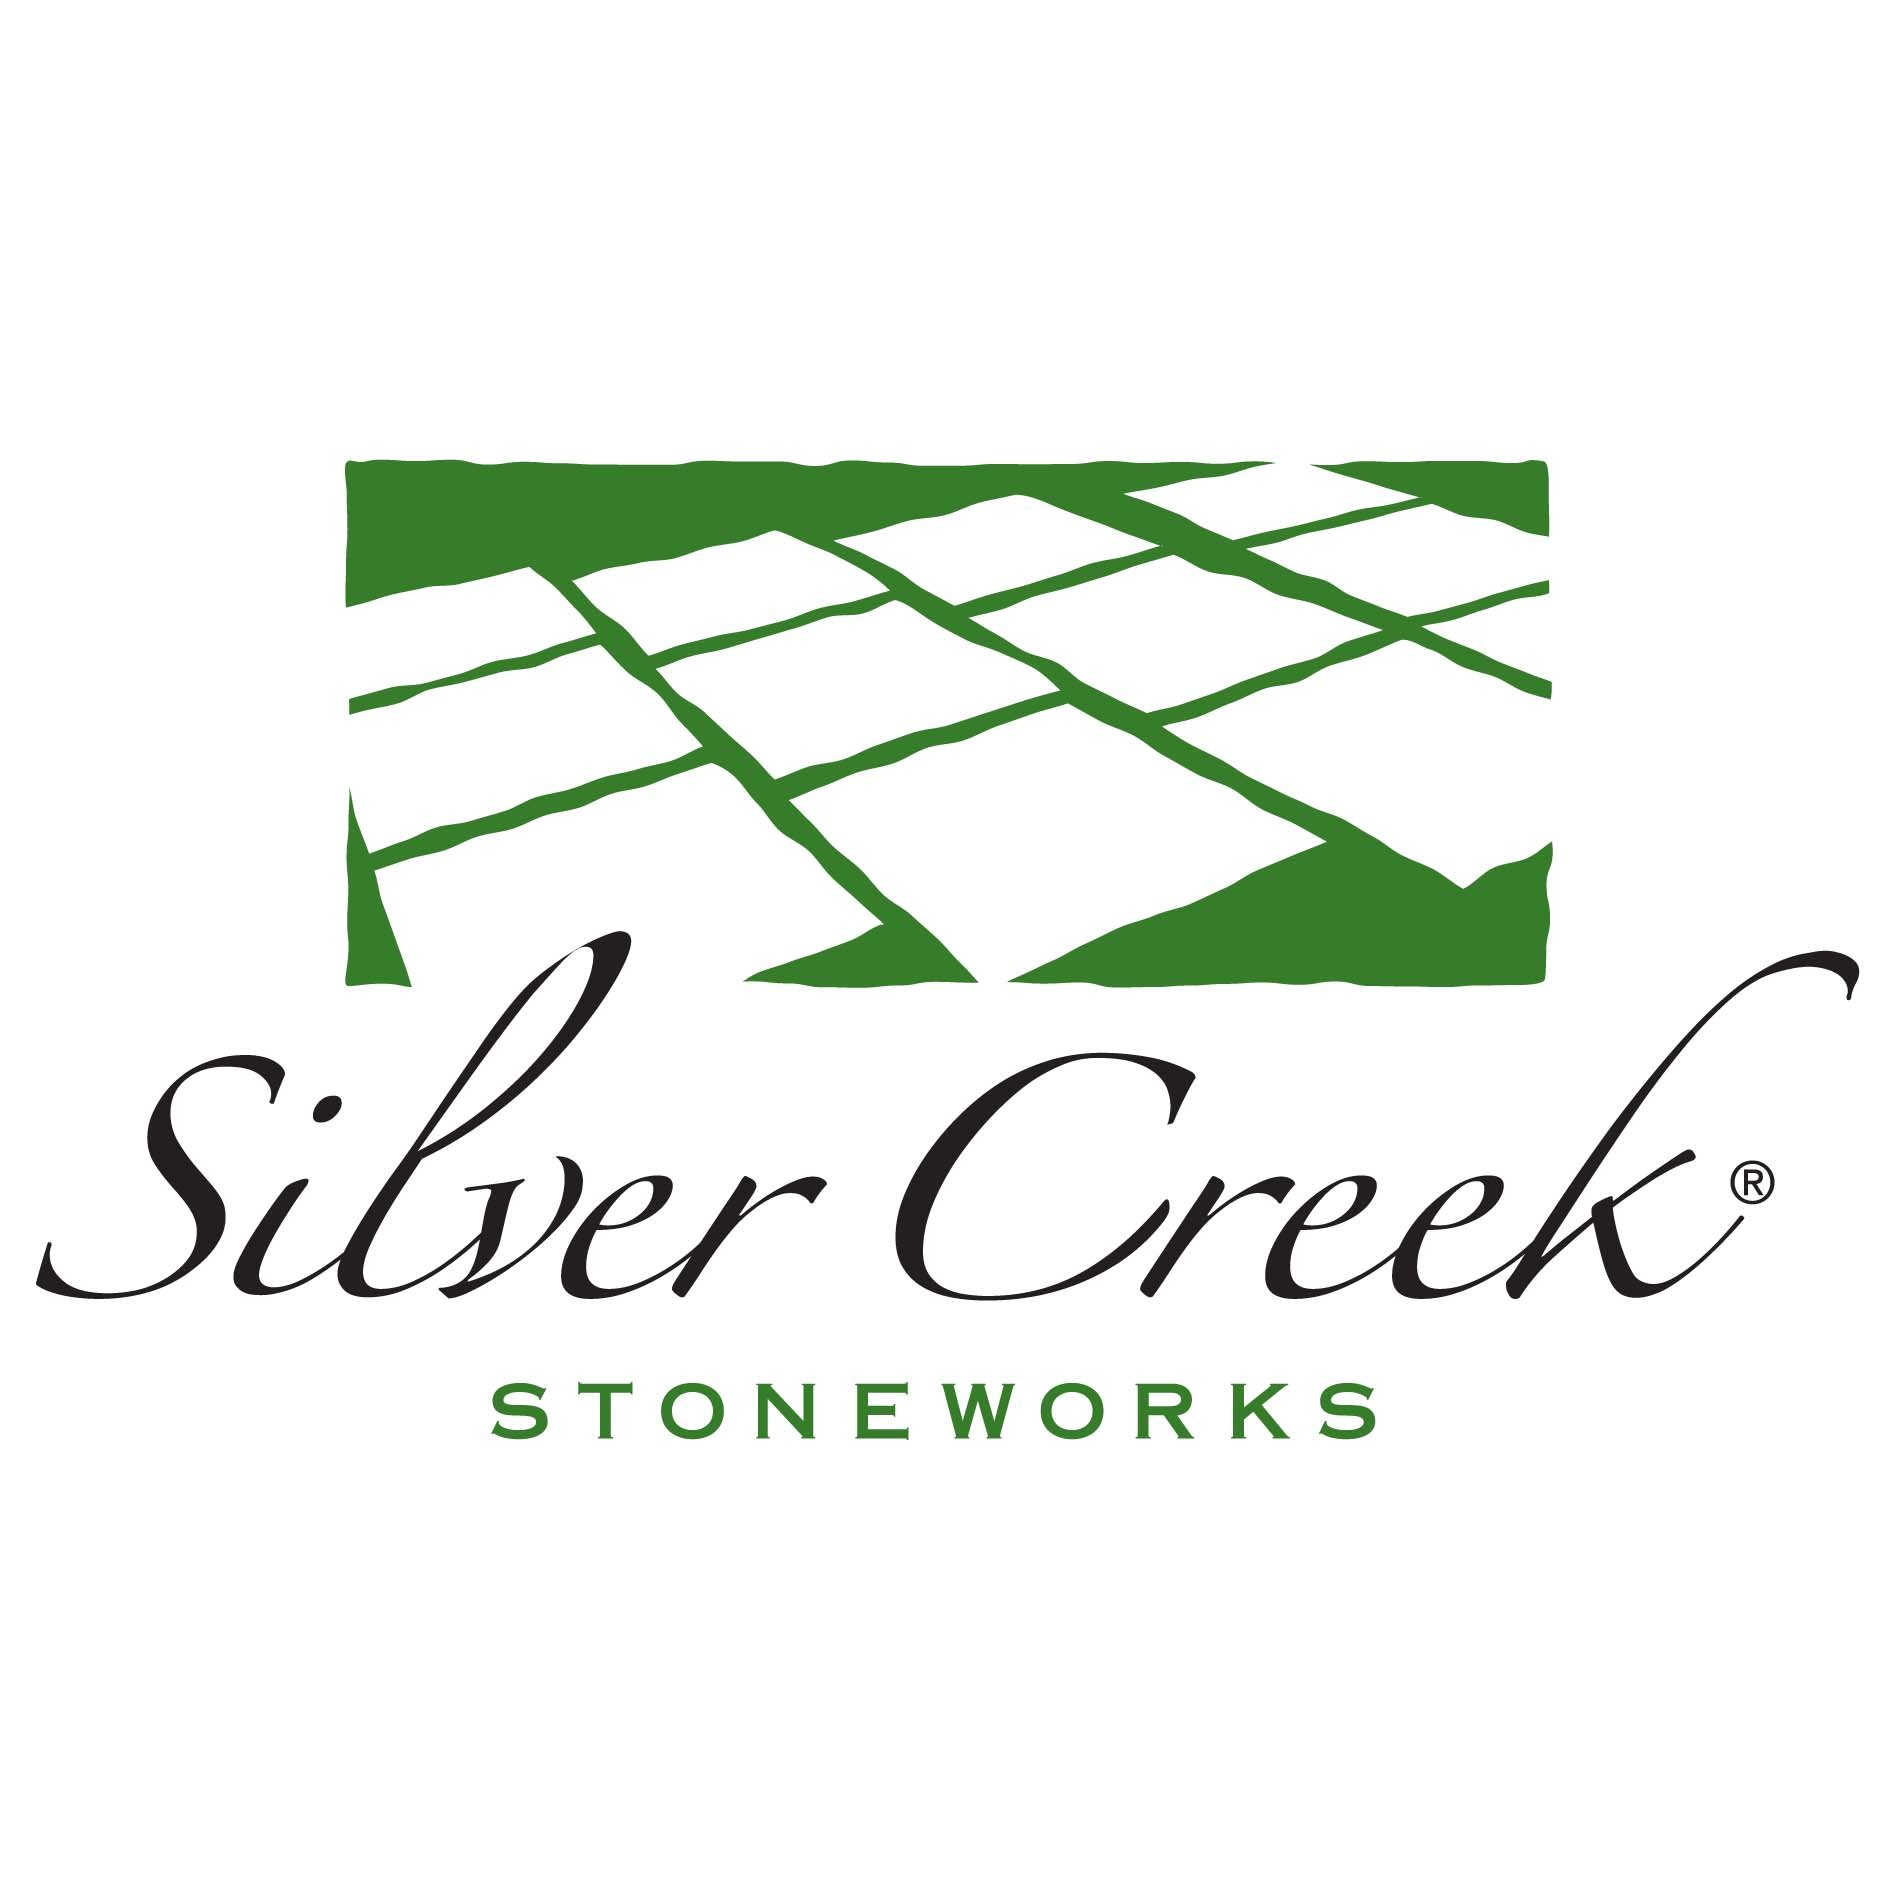 Silver Creek Stoneworks